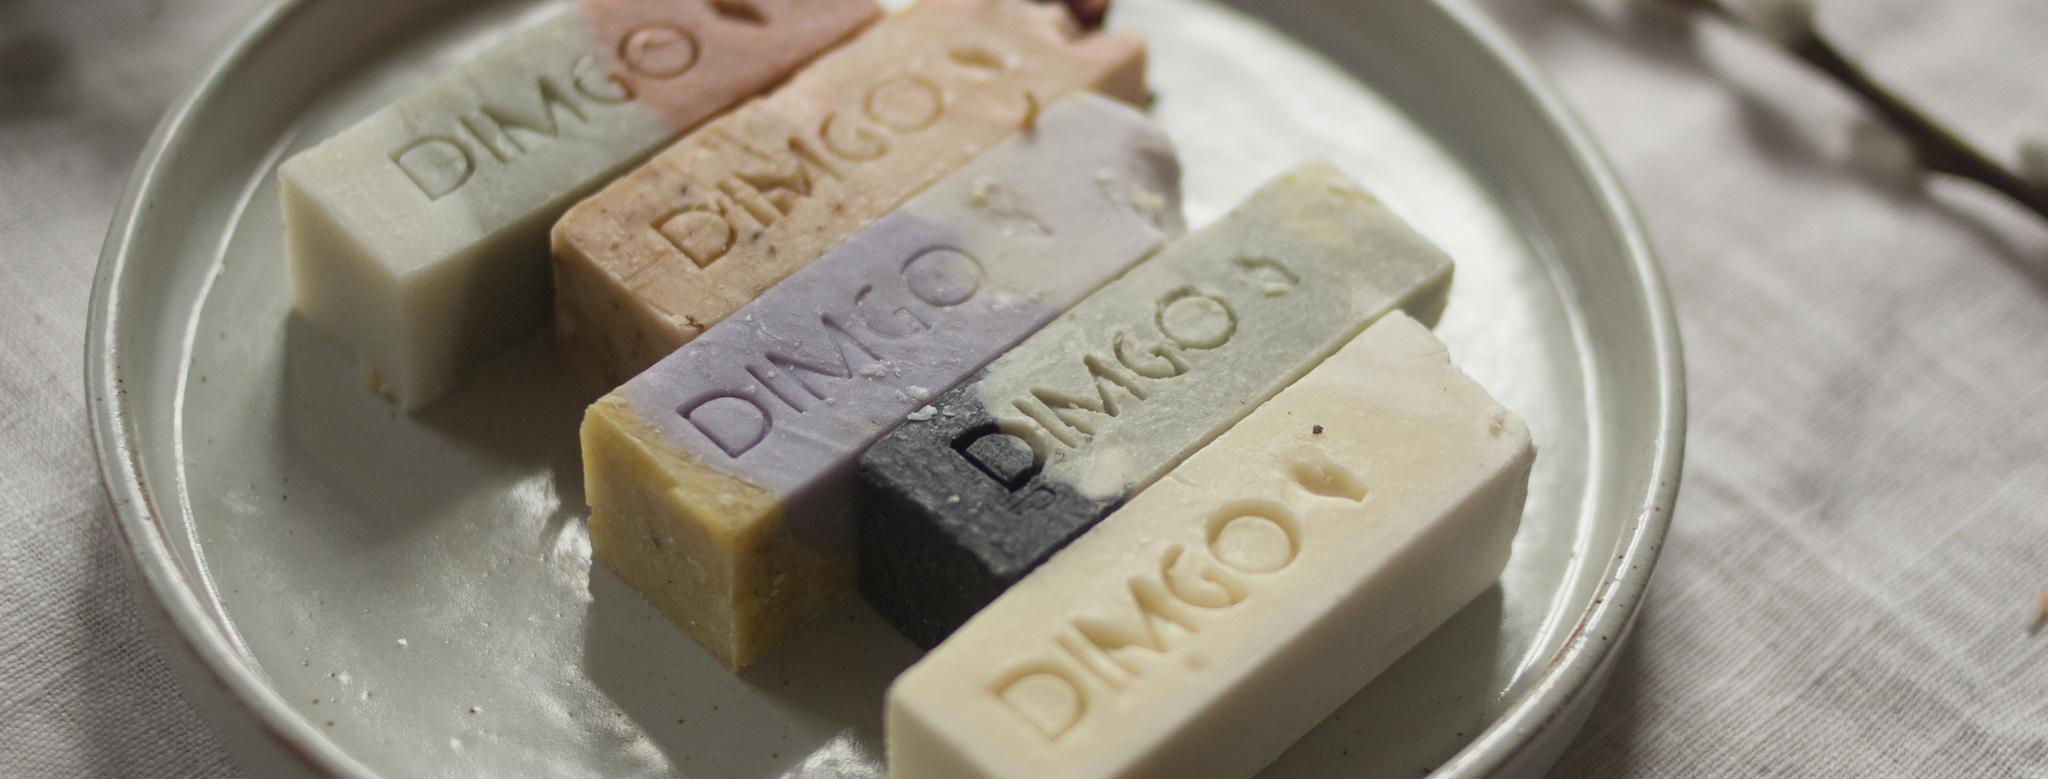 Dimgo Handmade